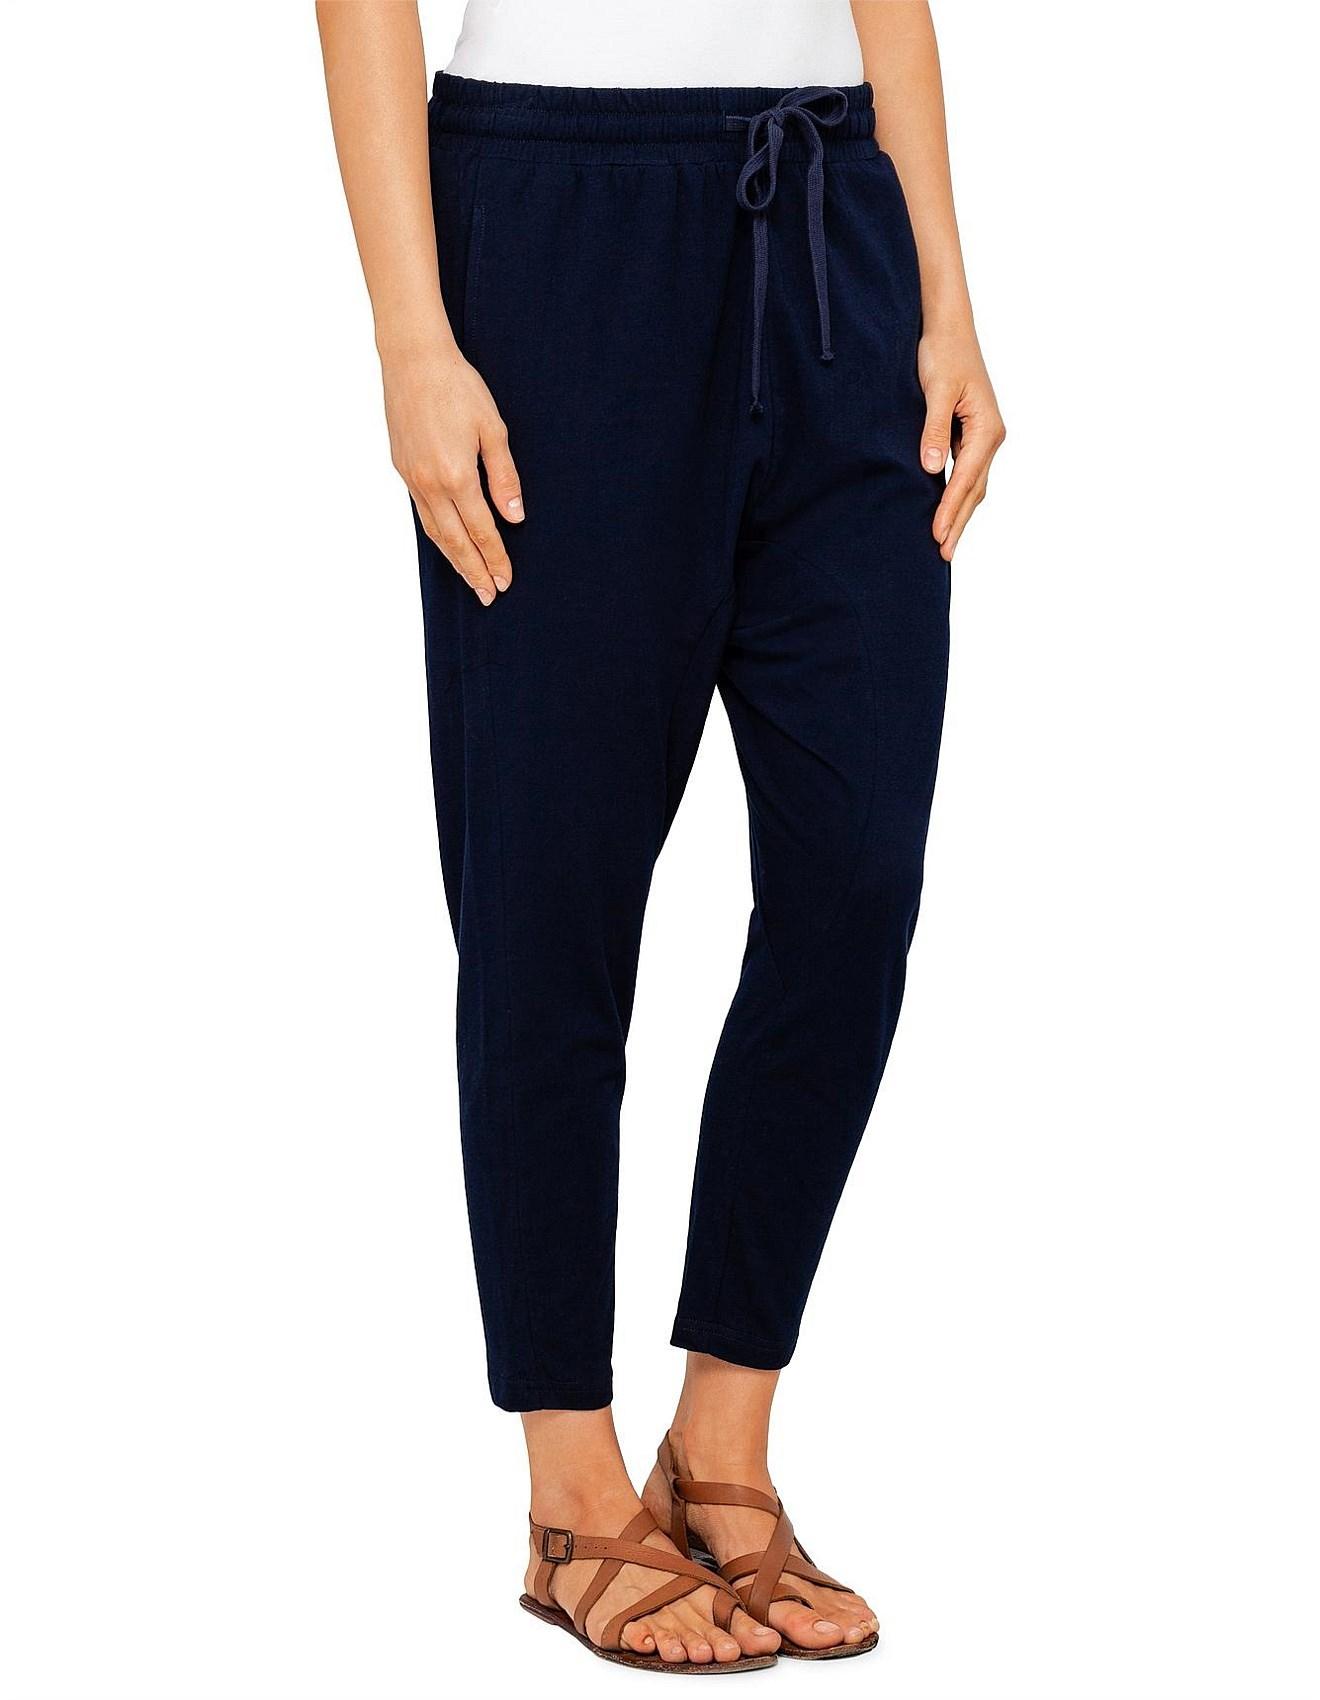 d1ec7e8da71 Women's Pants | Trousers, Culottes & Leggings | David Jones - Willa ...